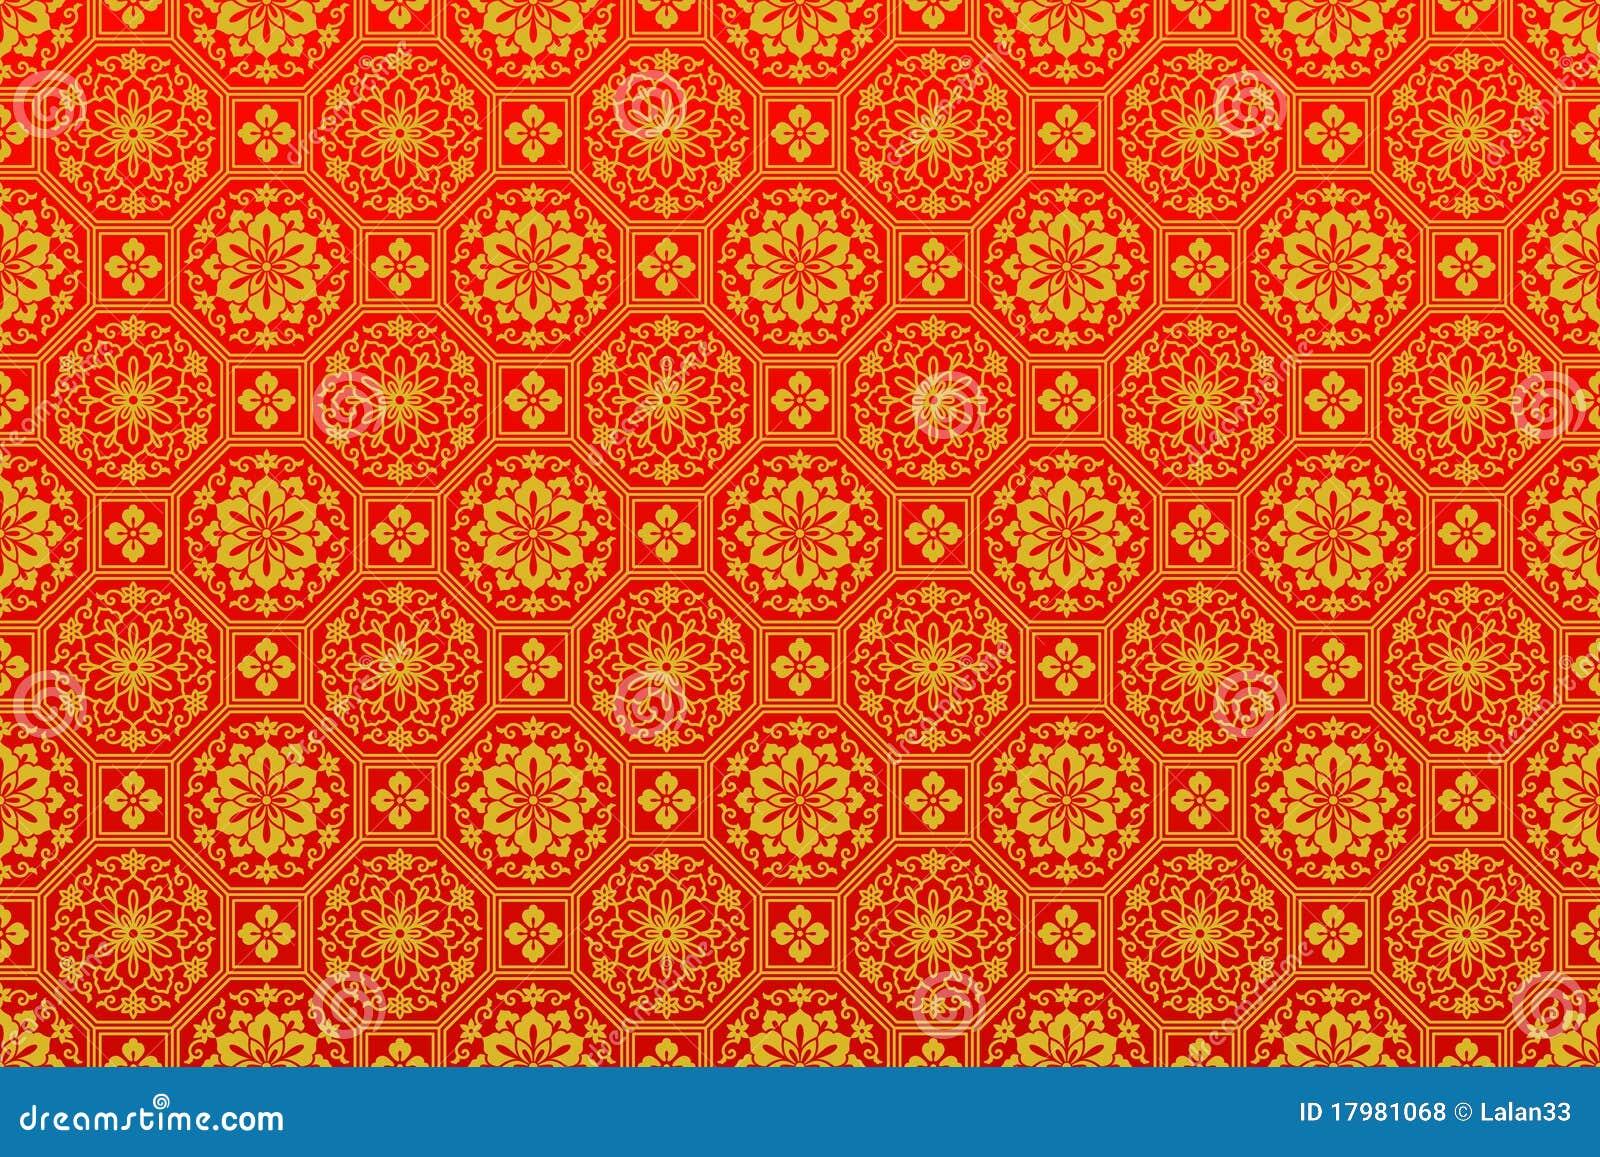 Chinese Background Royalty Free Stock Photos - Image: 17981068